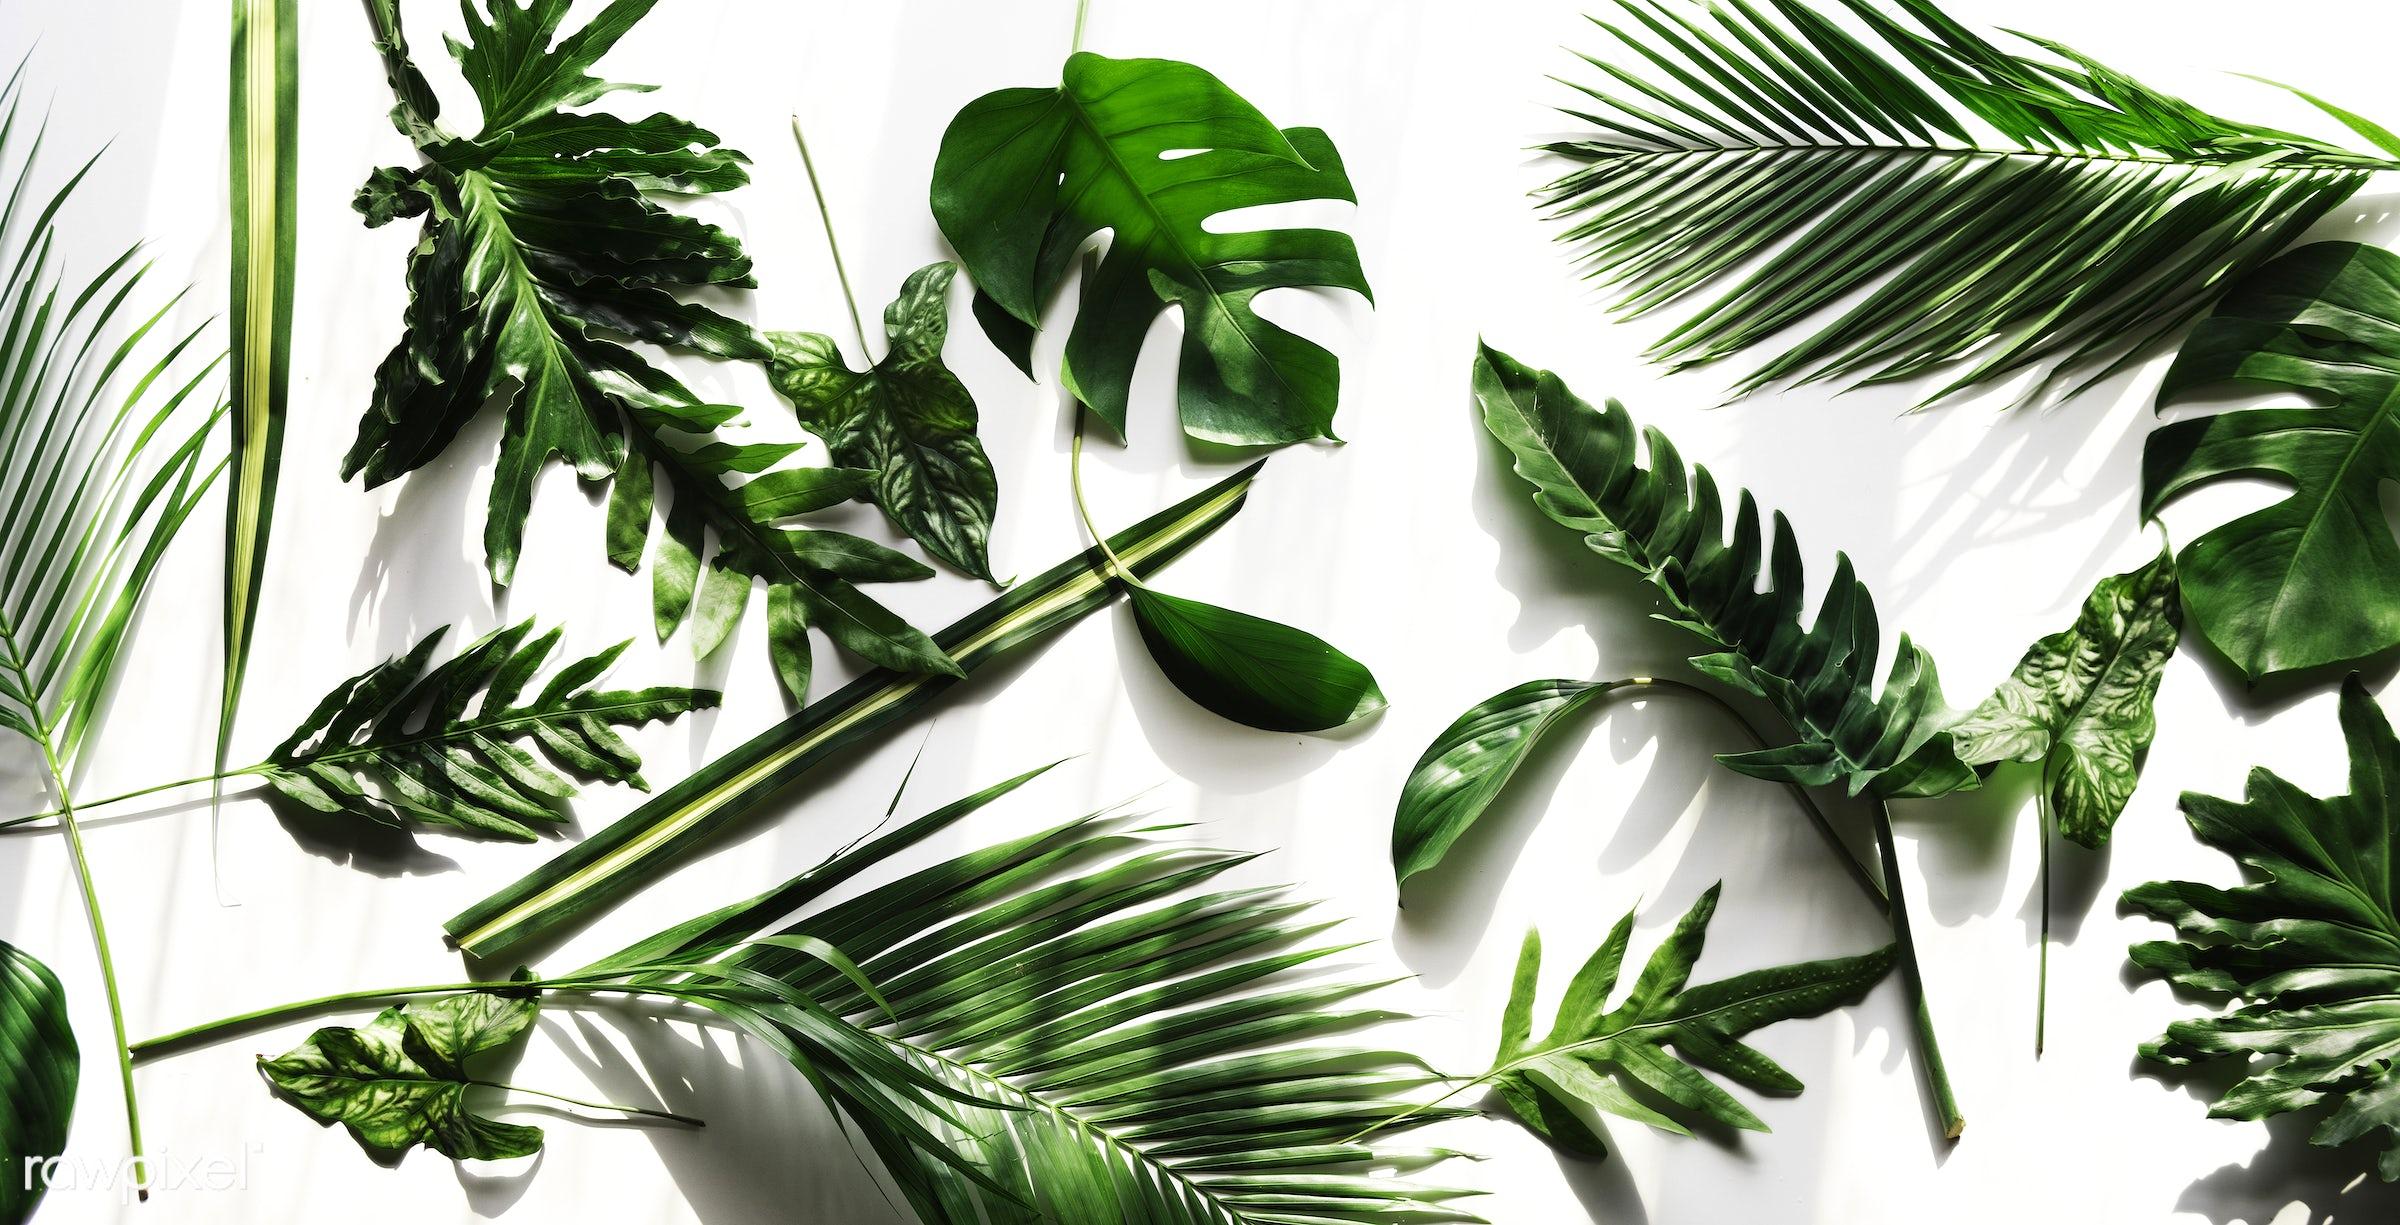 plant, isolated, botany, decoration, flora, refreshment, leisure, leaf, florist, recreational, fresh, natural